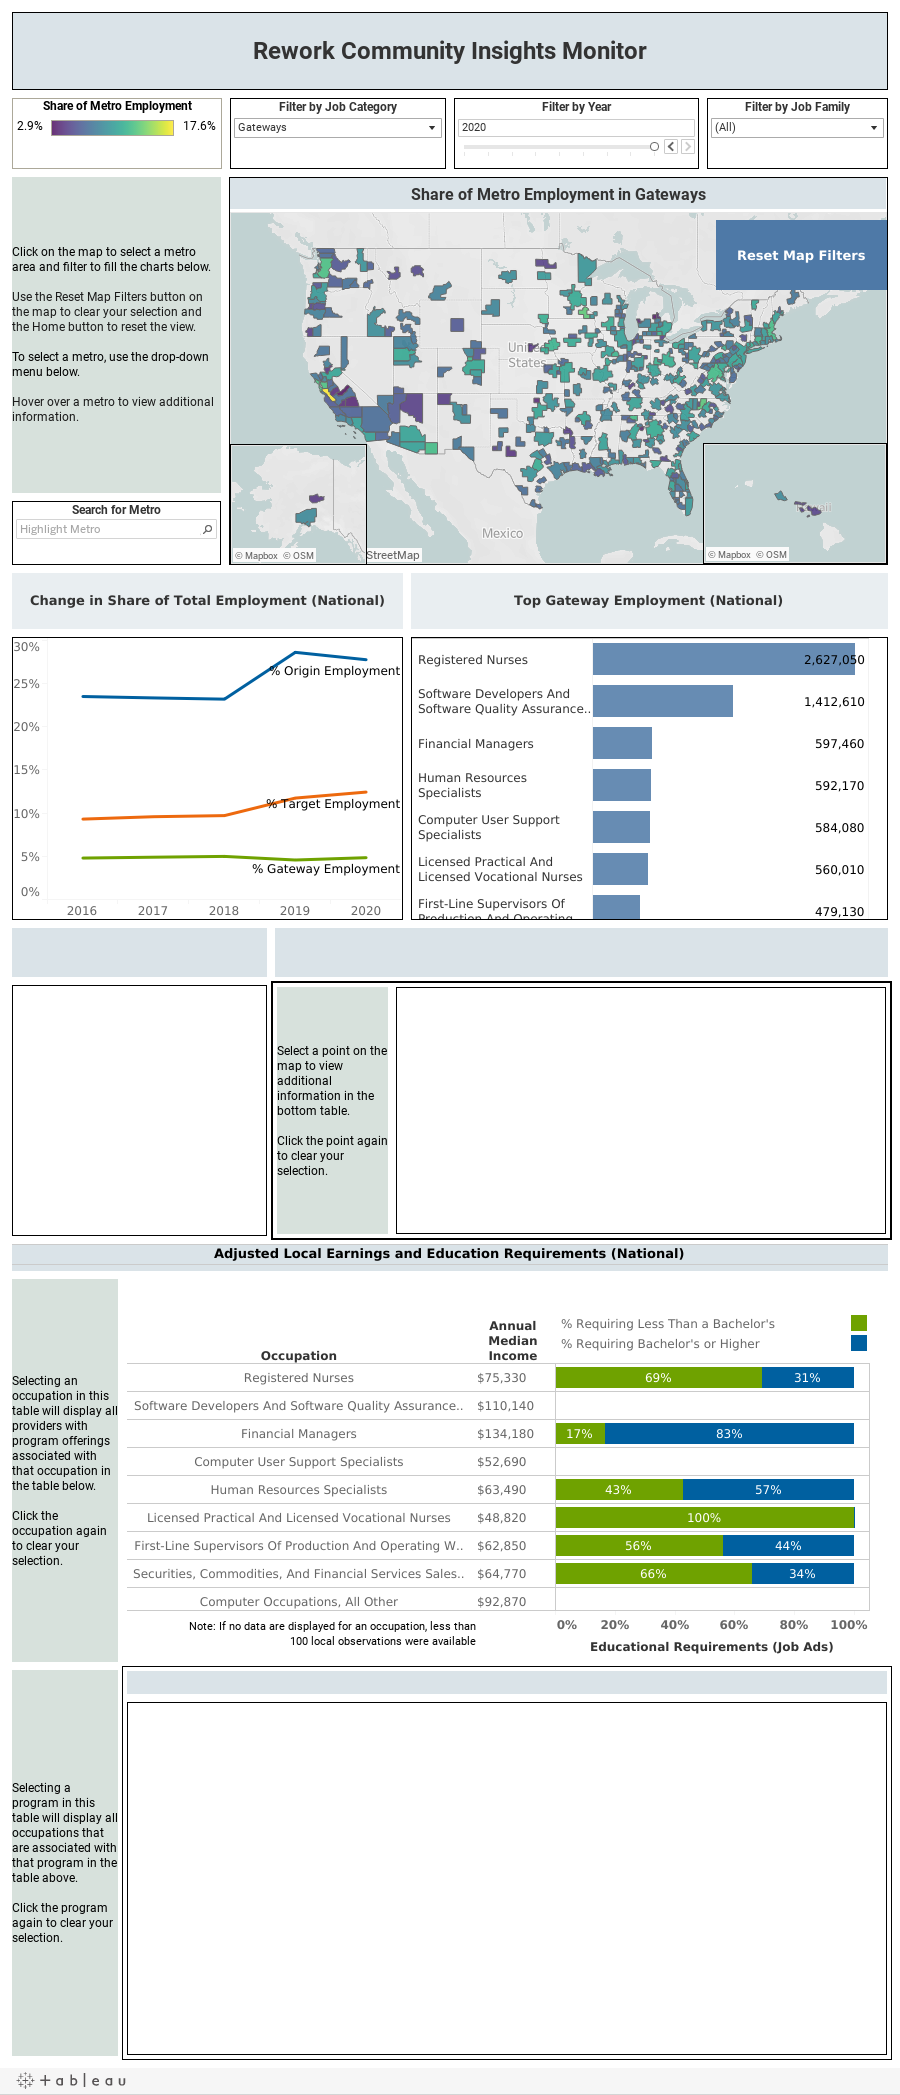 Rework Community Insights Monitor